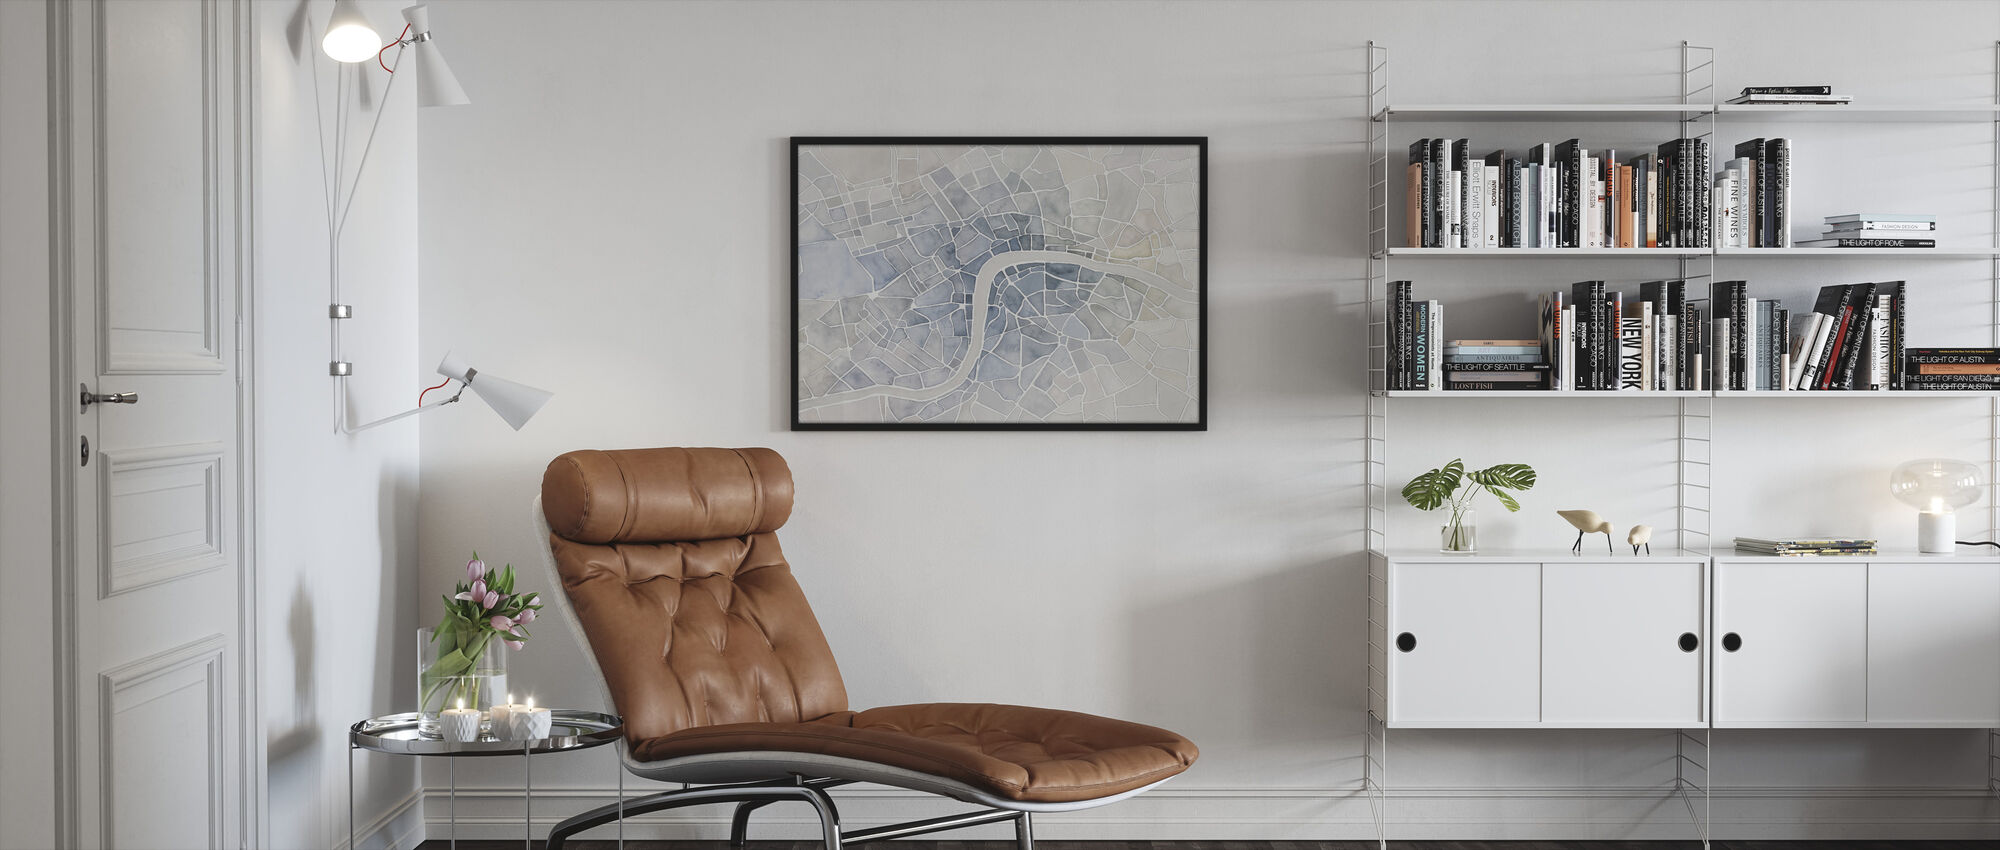 Watercolor Wanderlust London - Framed print - Living Room